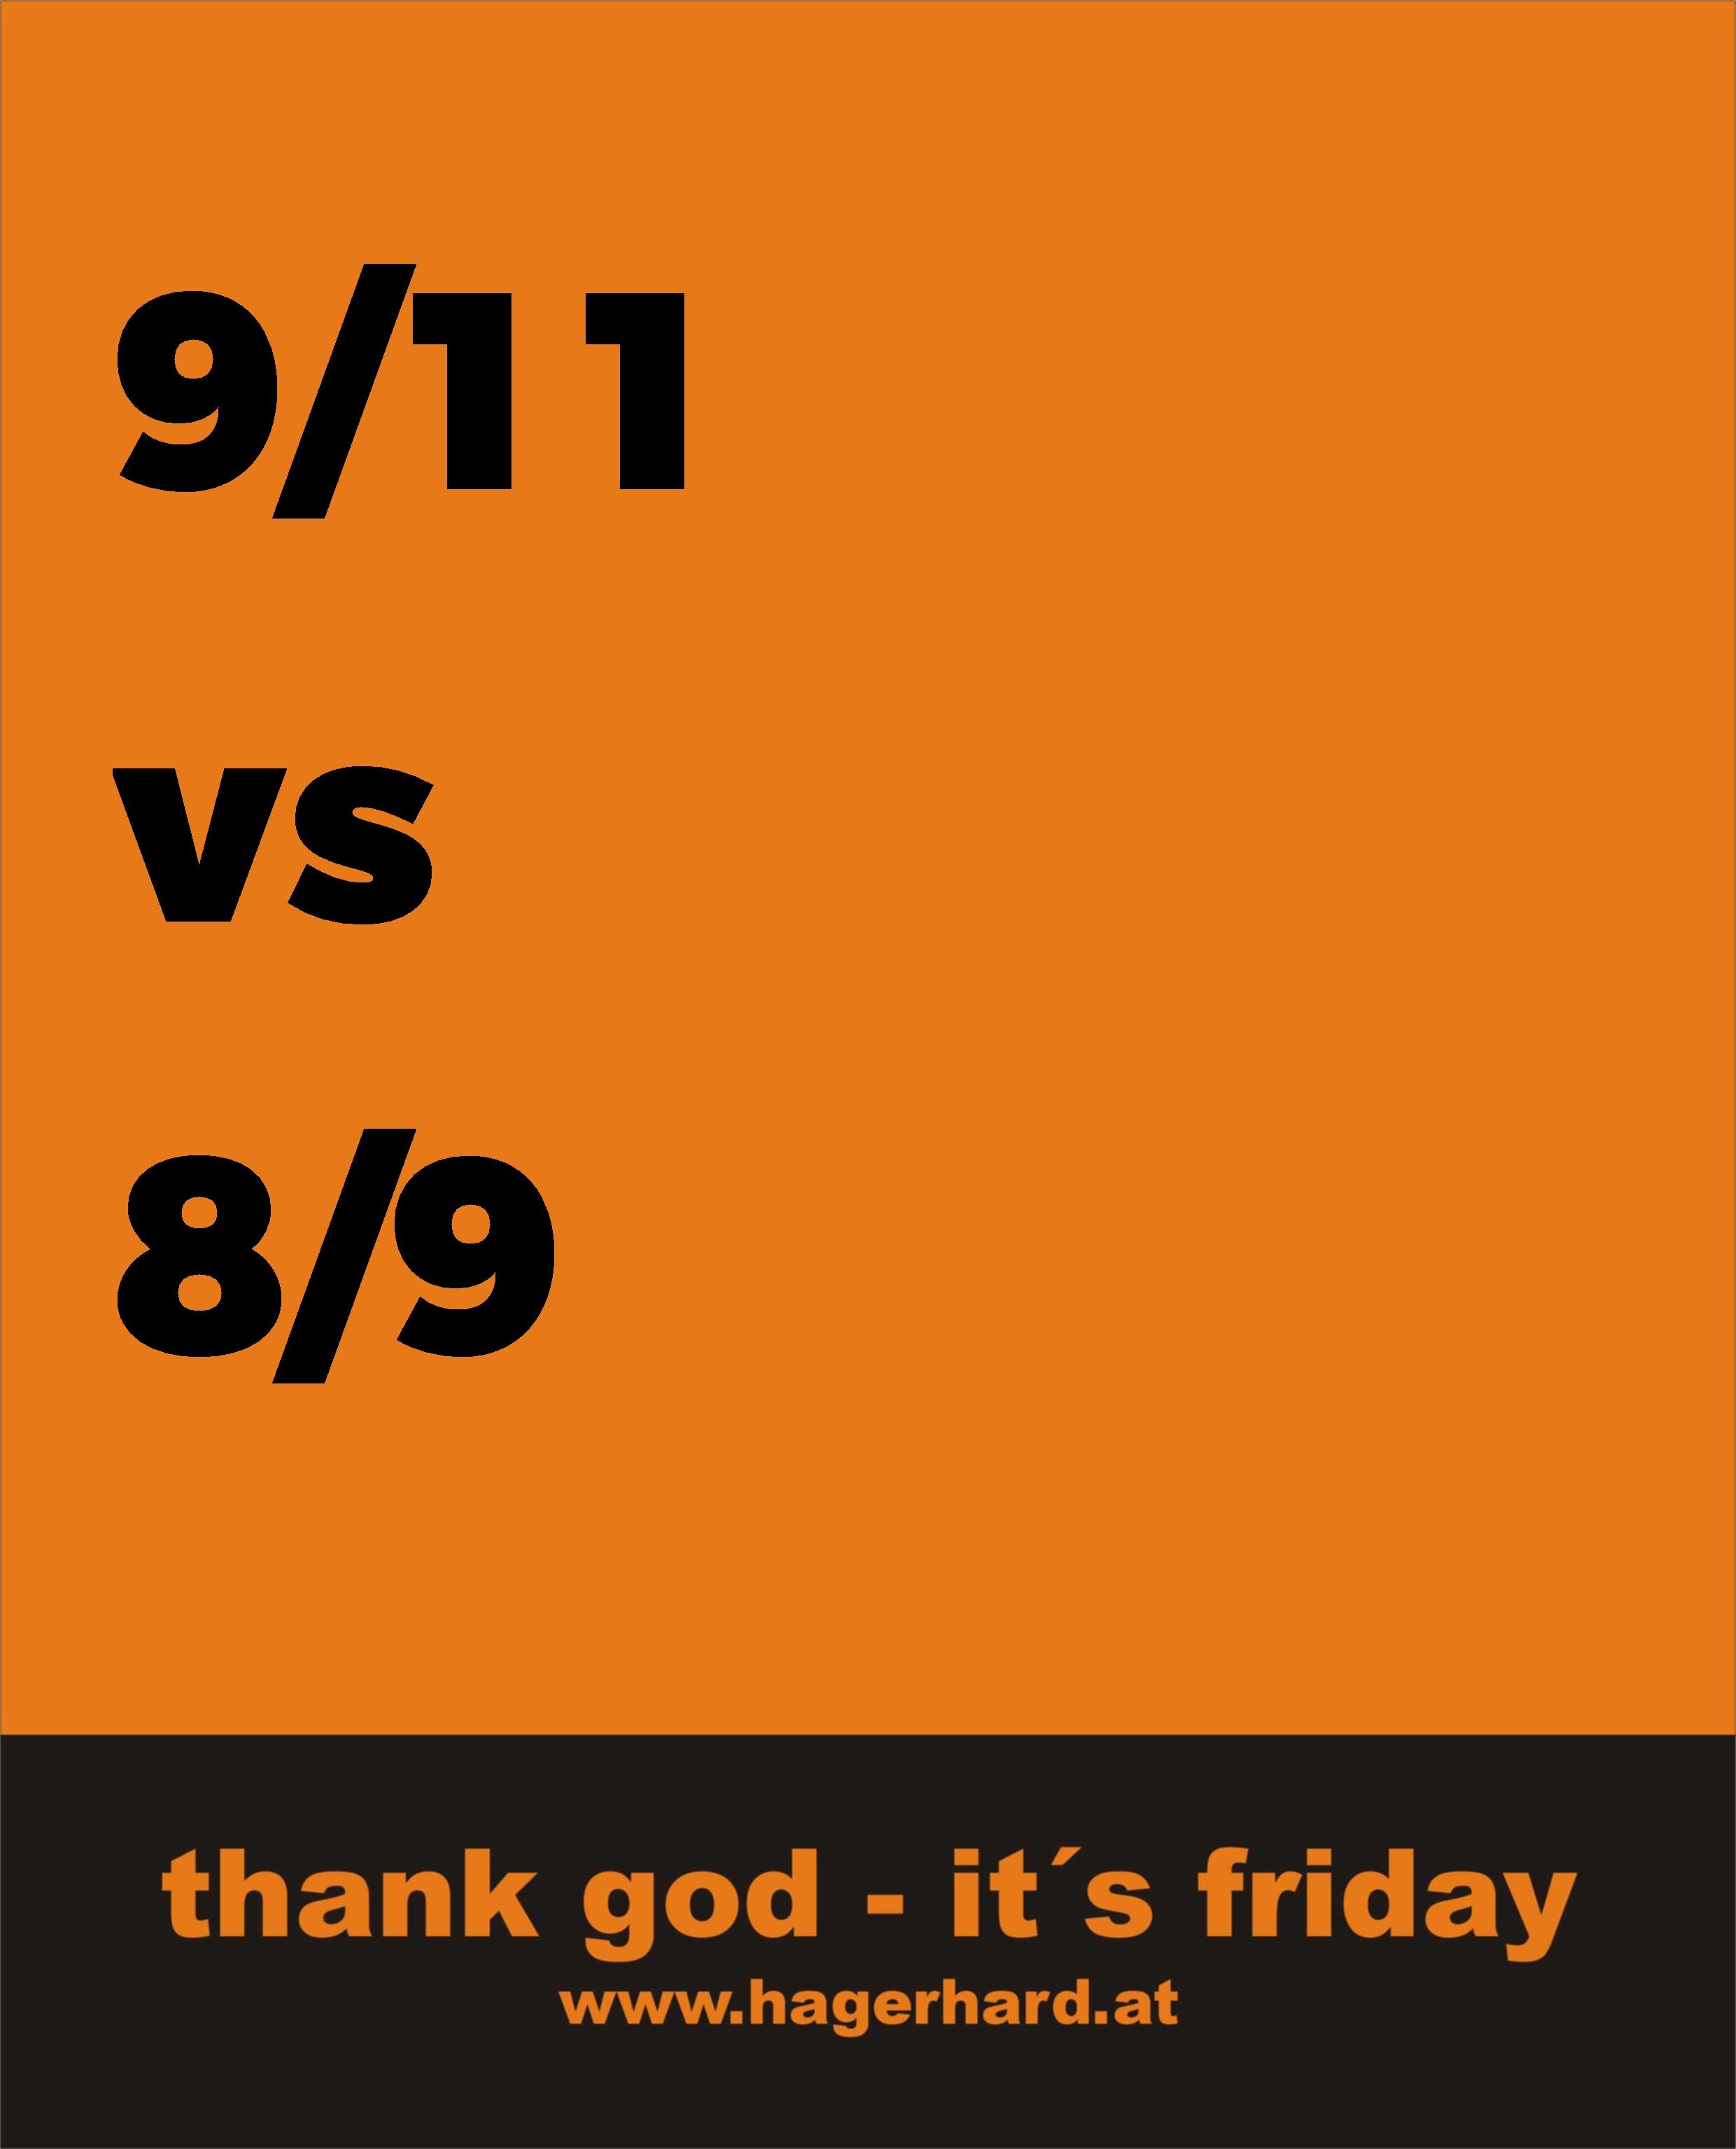 9/11 vs 8/9